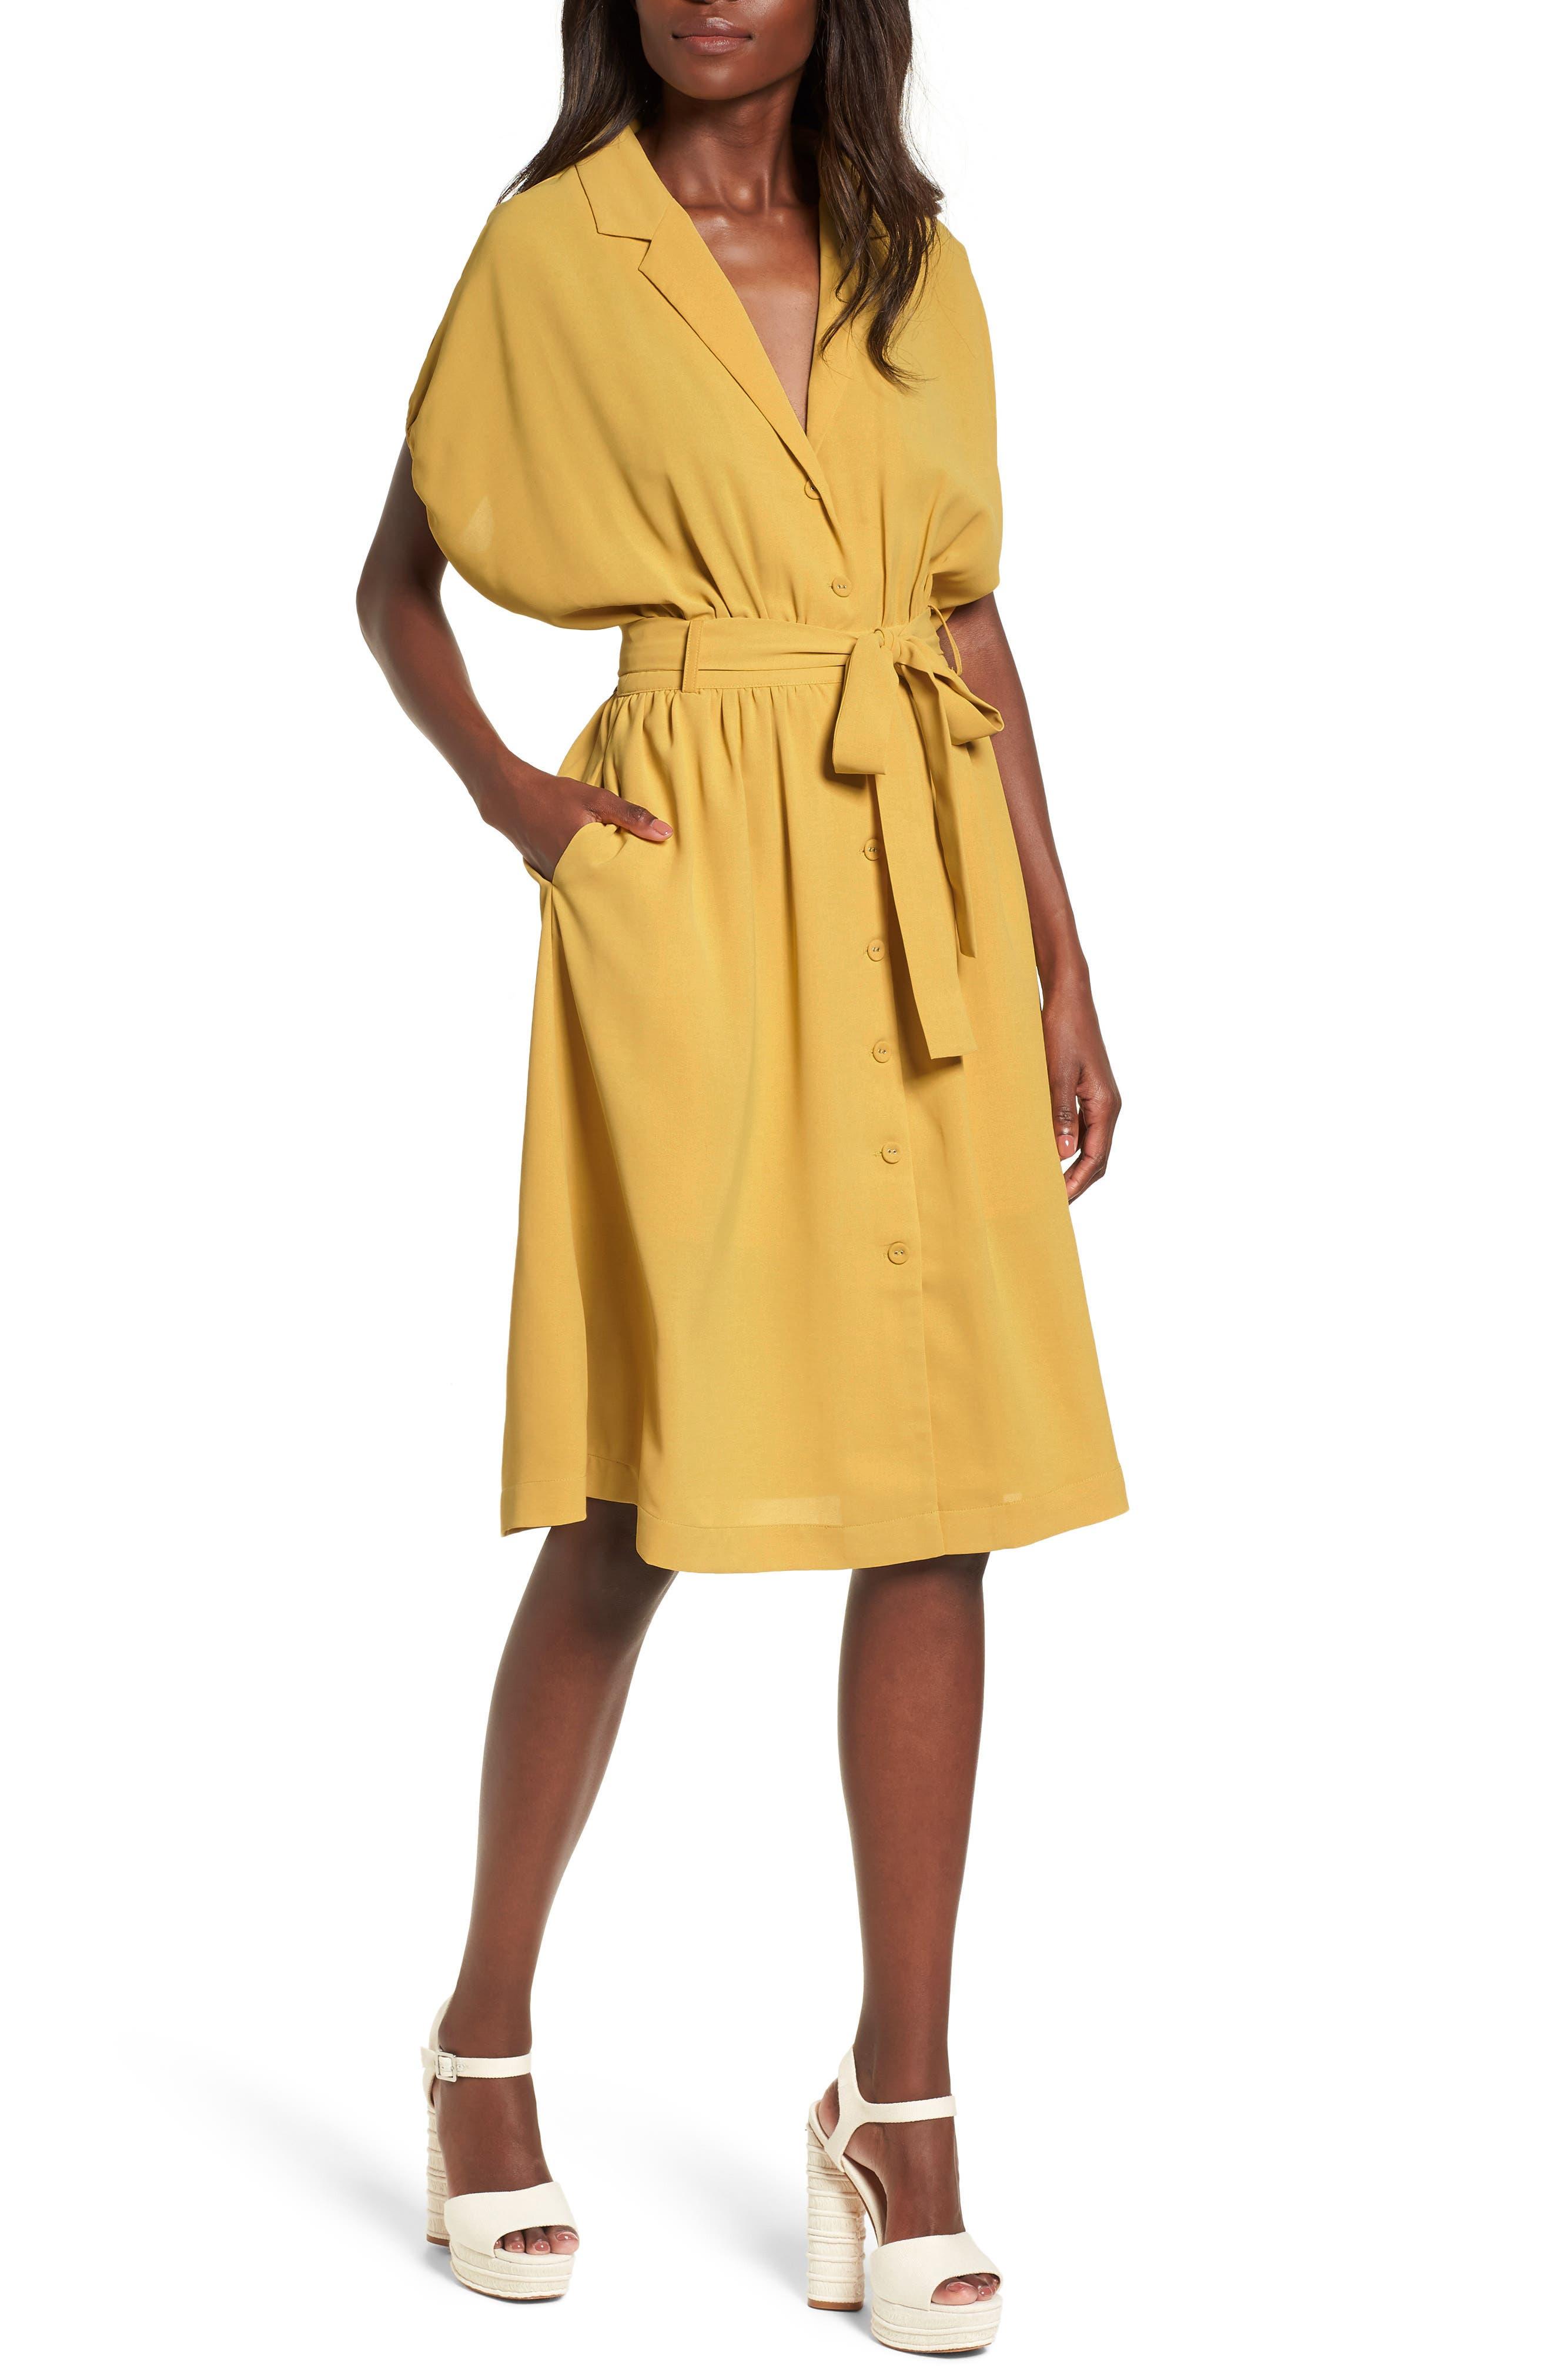 Chriselle x J.O.A. Cocoon Sleeve Dress,                             Main thumbnail 1, color,                             700